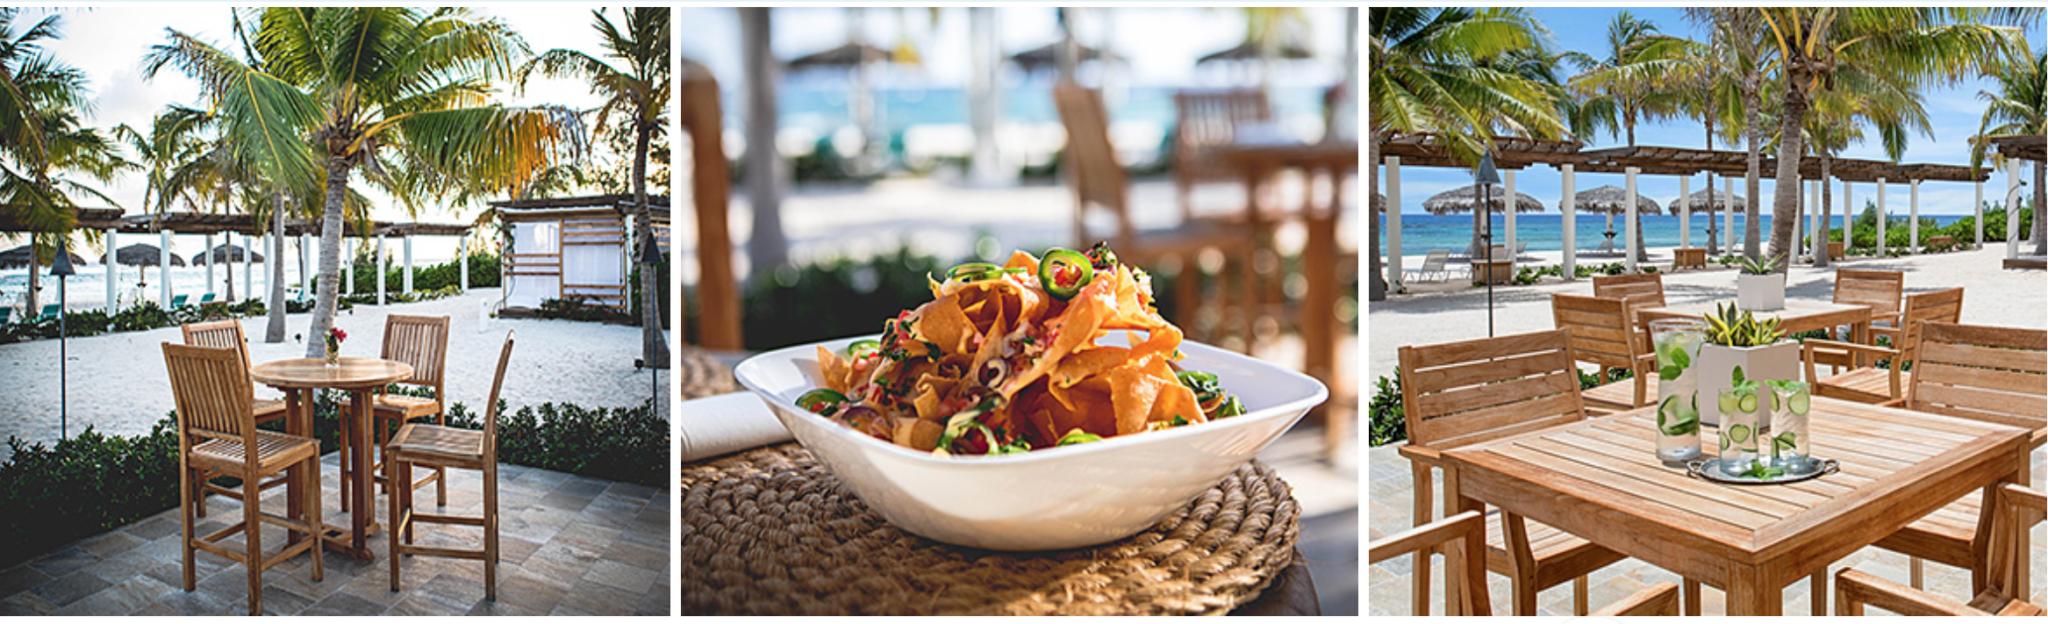 Le Soleil d'Or Lemon Bar & Restaurant Cayman Brac